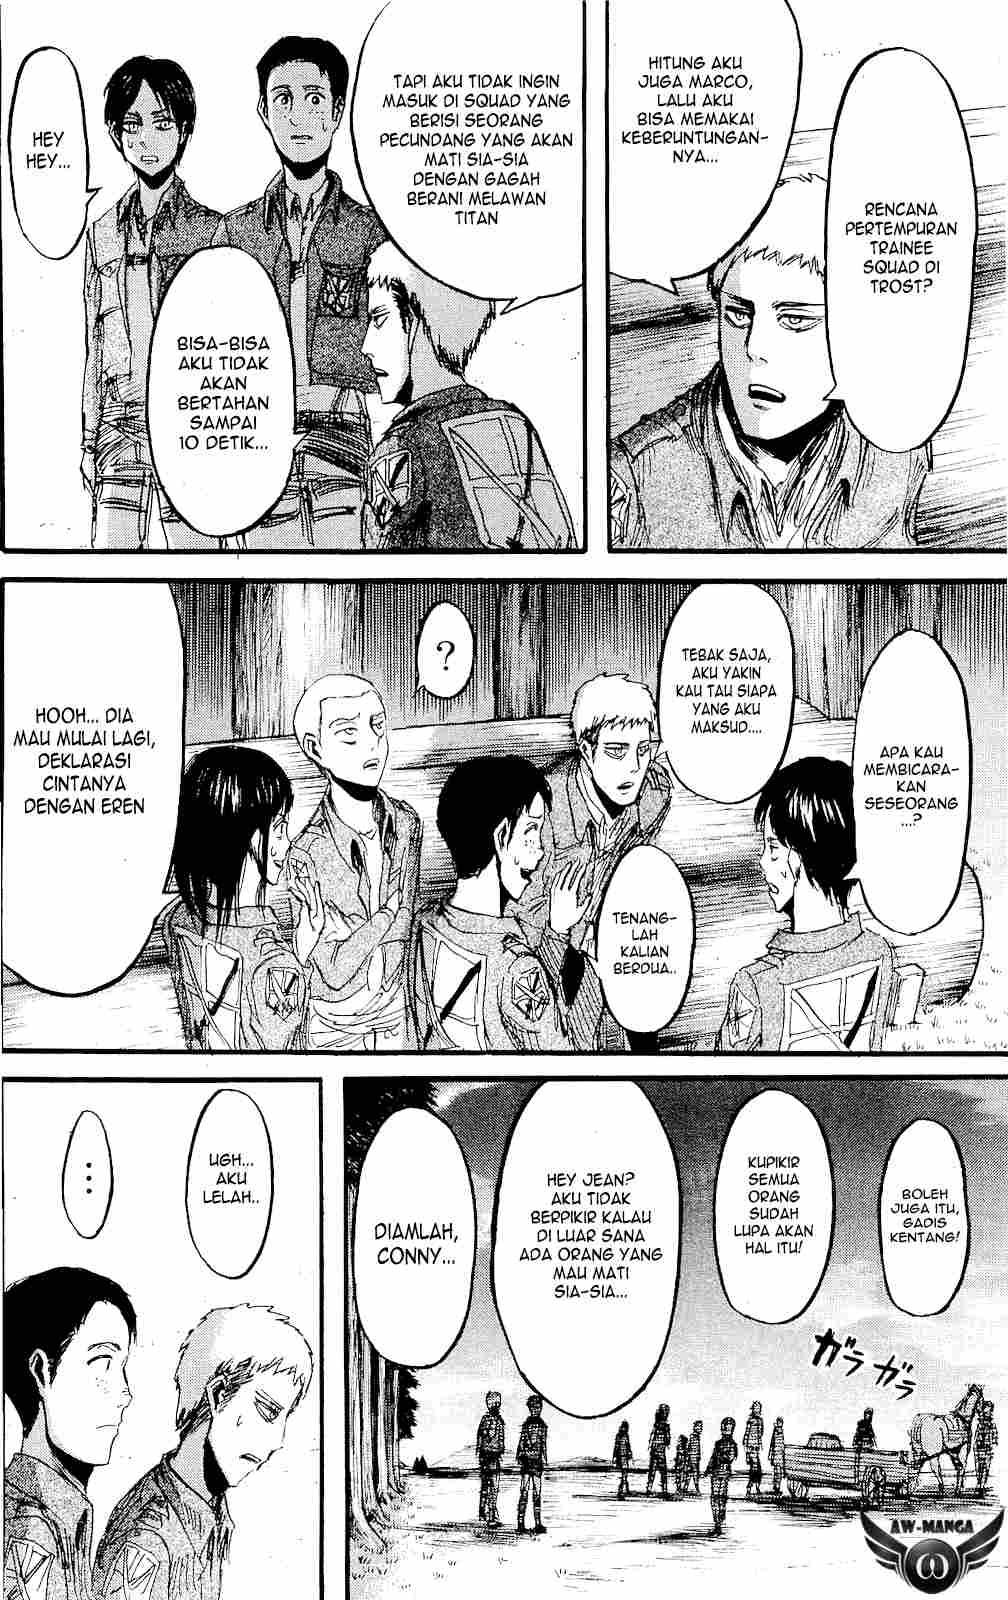 Komik shingeki no kyojin 018 - sekarang apa yang harus dilakukan 19 Indonesia shingeki no kyojin 018 - sekarang apa yang harus dilakukan Terbaru 15|Baca Manga Komik Indonesia|